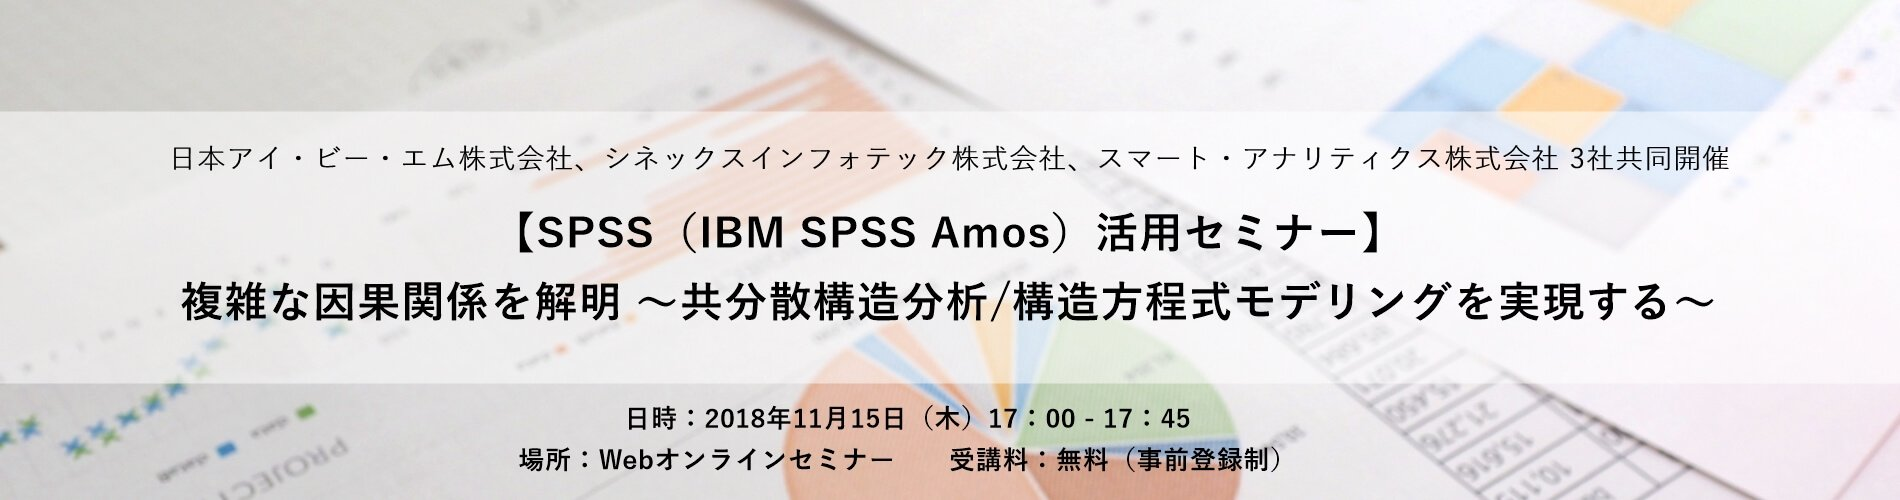 SPSS(IBM SPSS Amos)活用セミナー